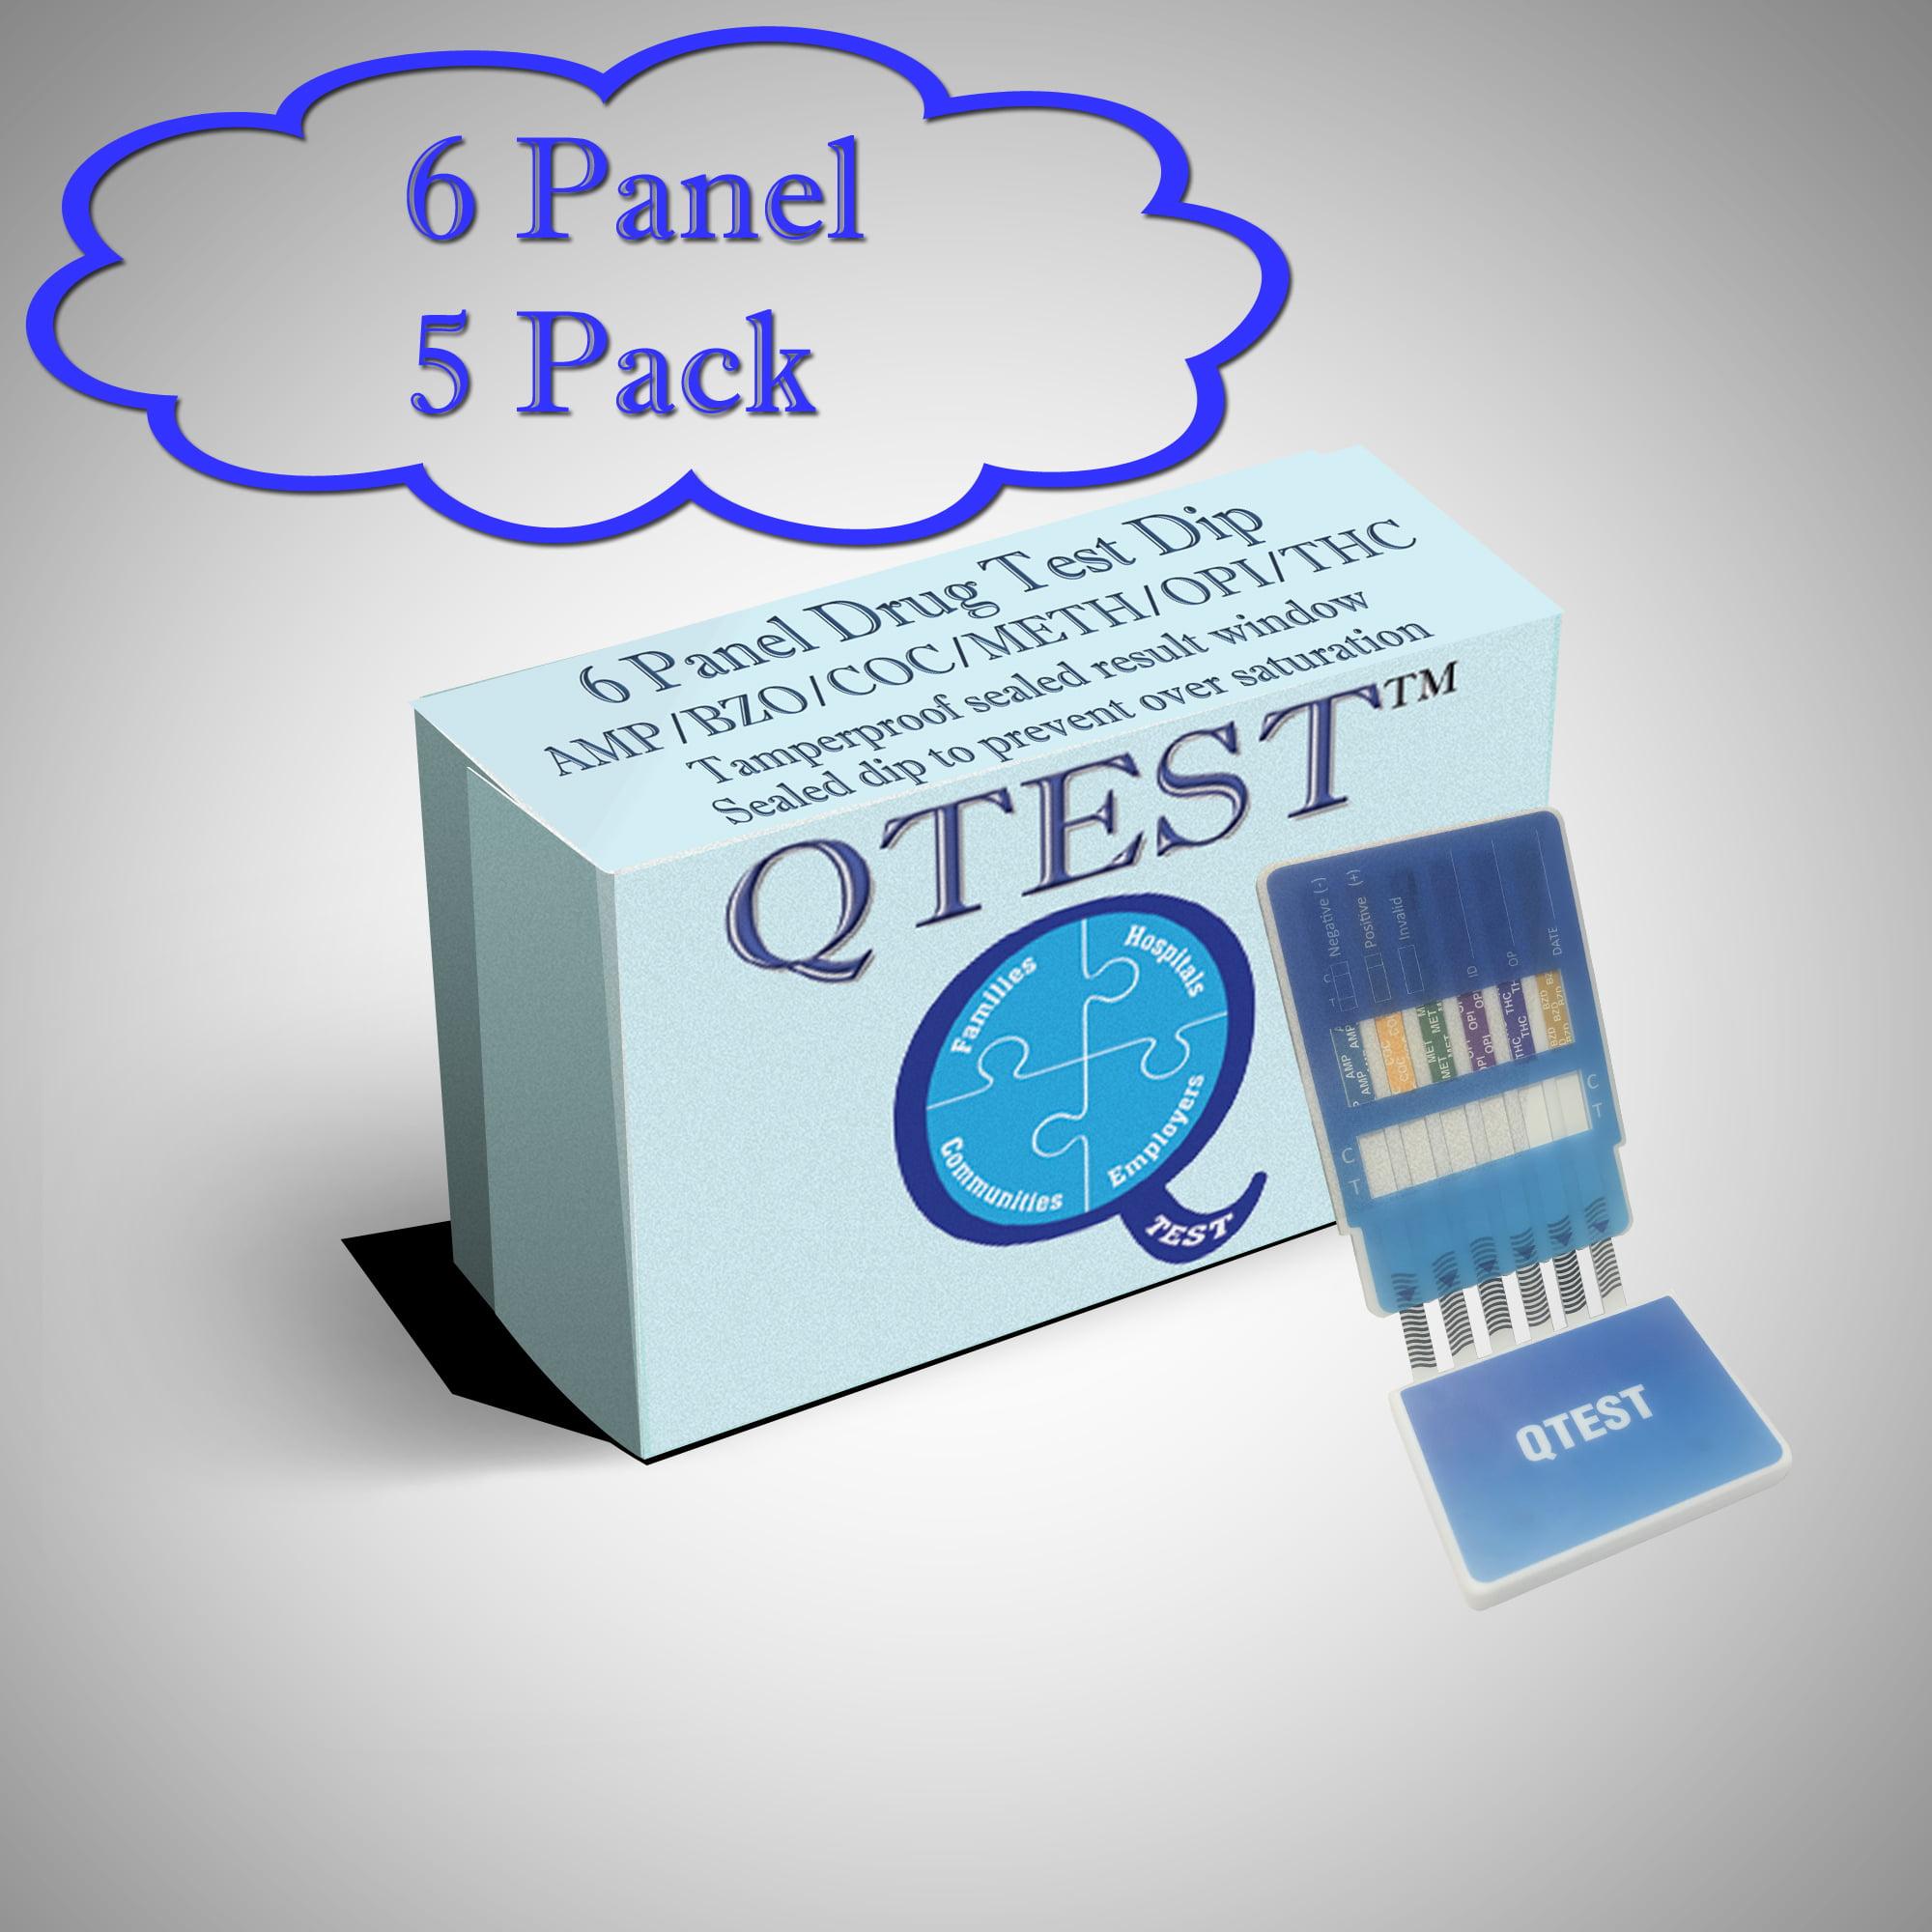 (5 Pack) QTEST 6 Panel Urine Drug Test Dip Tamper Proof - Amp (Amphetamine), Bzo (Benzodiazepine), Coc (Cocaine), Mamp (Methamphetamine, Opi (Opiates), Thc (Marijuana)